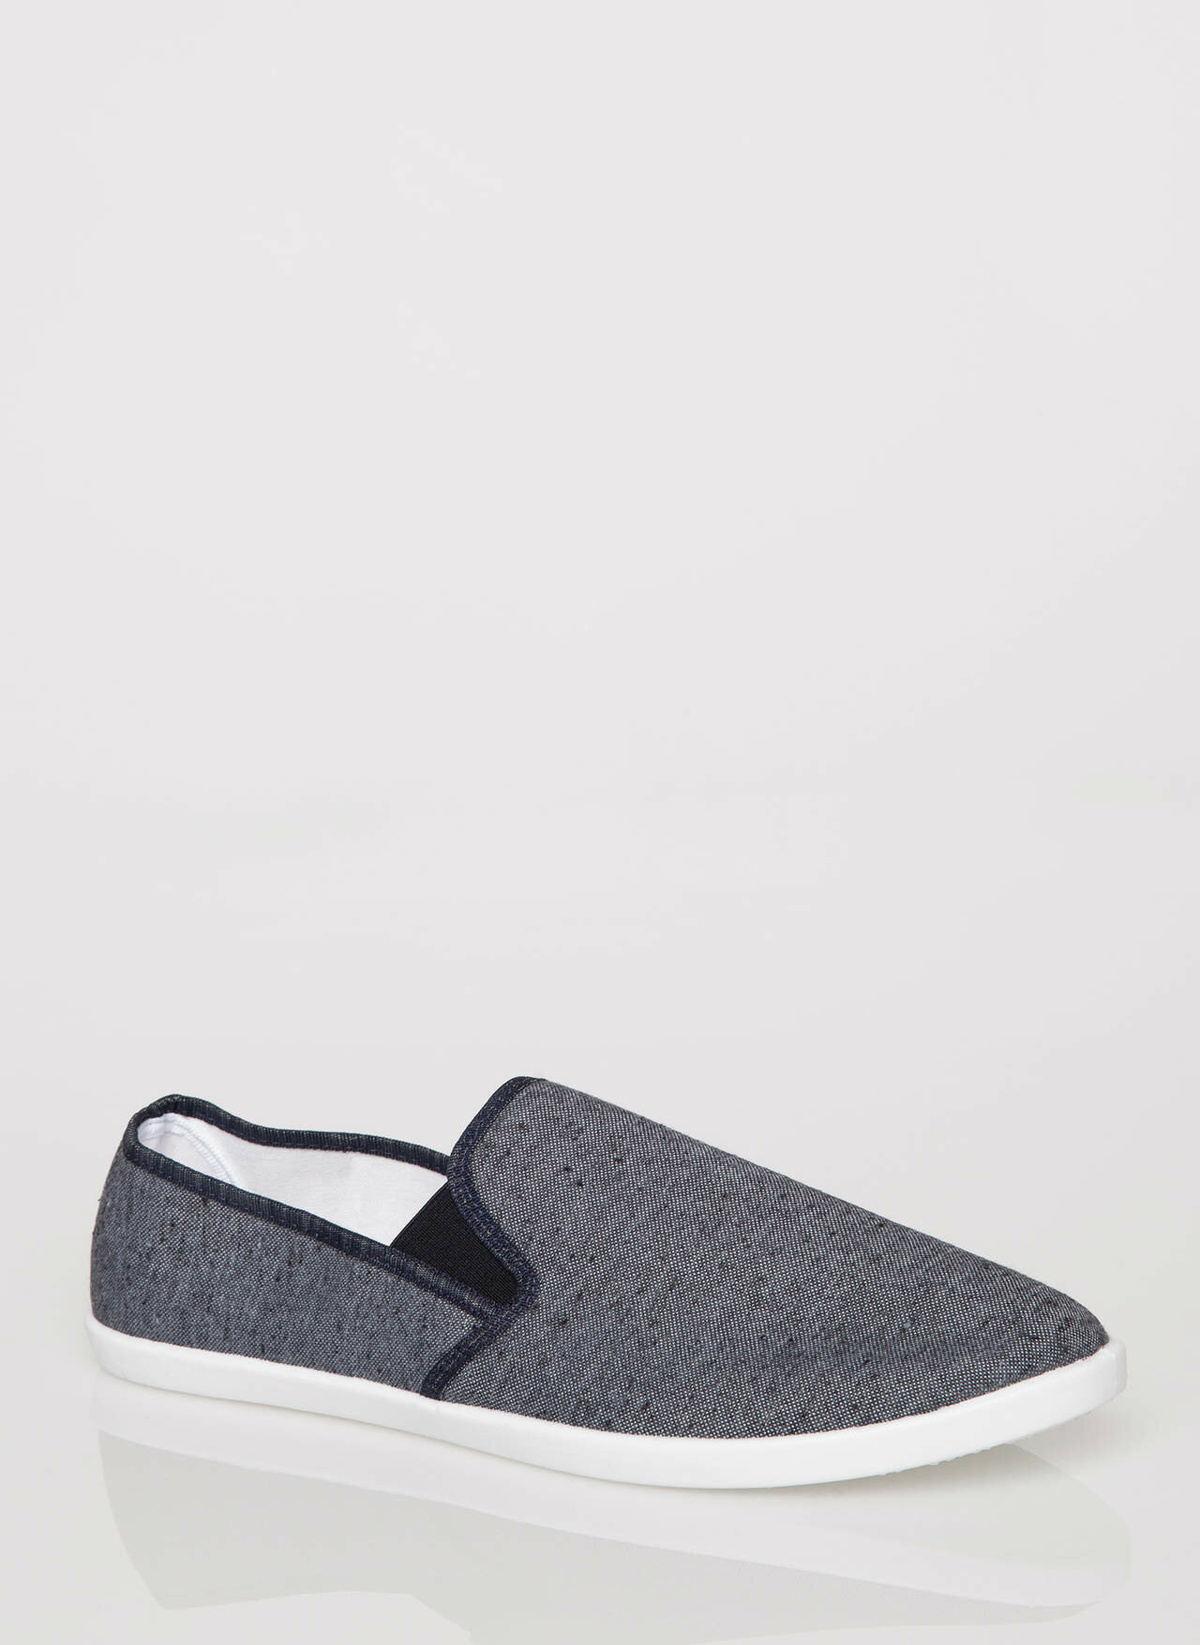 Defacto Spor Ayakkabı I3750az18spbe470 Ayakkabı – 39.99 TL